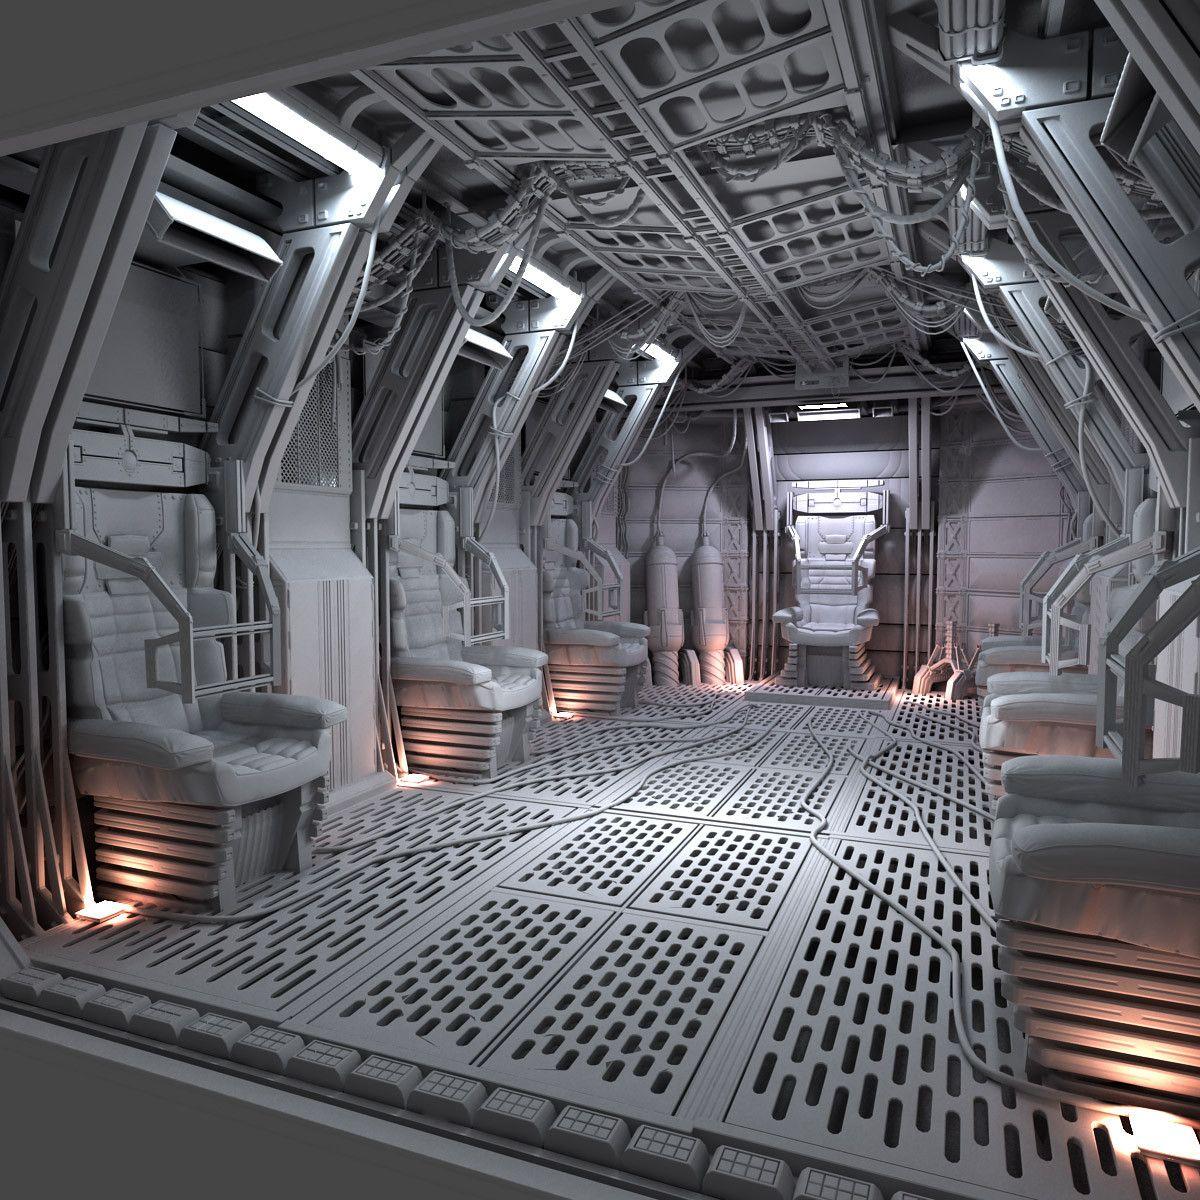 space shuttle interior 3d scan - photo #7